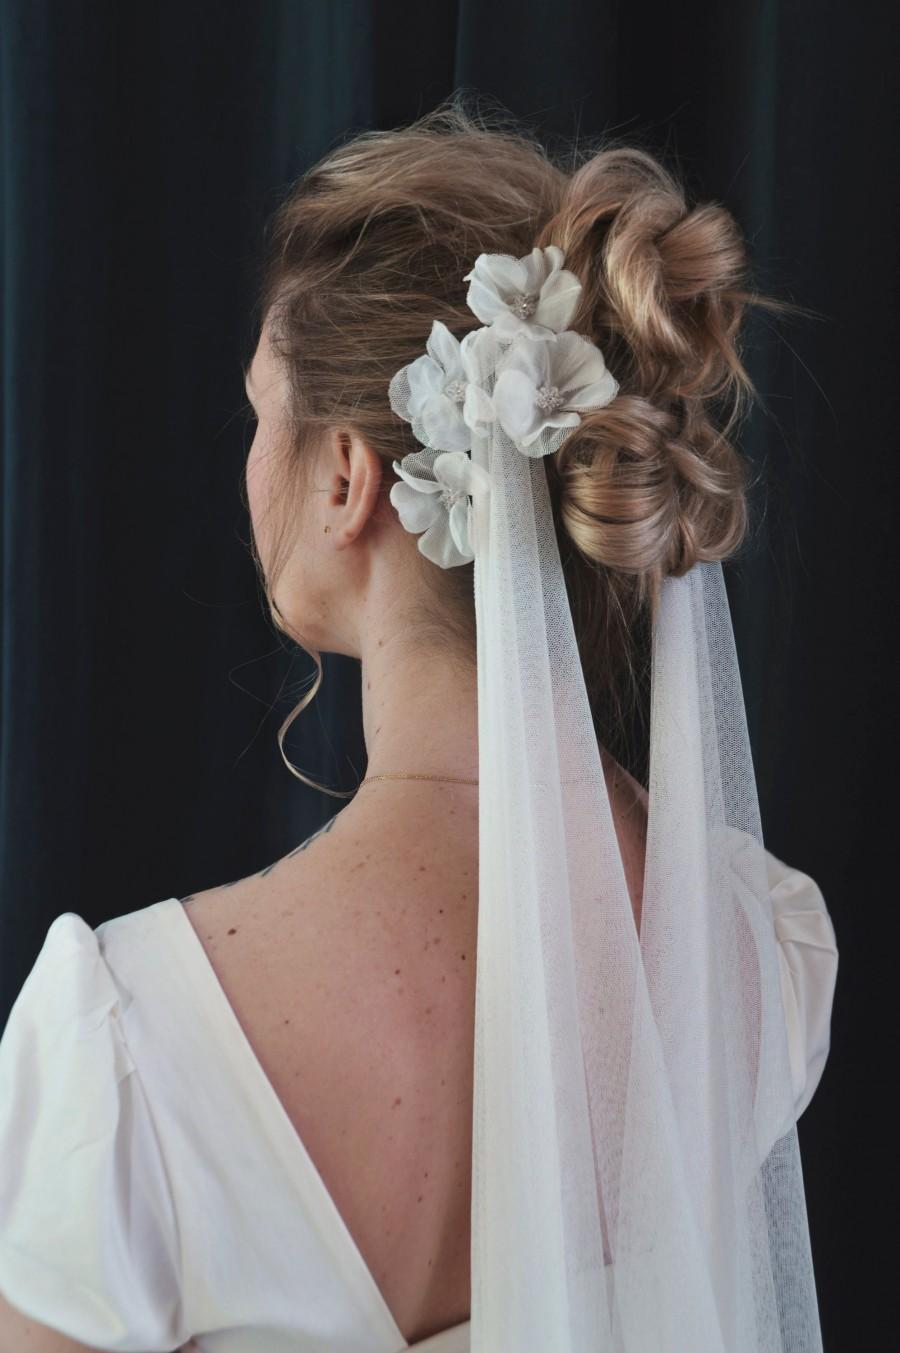 Wedding - Silk Veil, Wedding Veil, Draped Veil, Floral Veil, Bohemian Veil, Bridal Headpiece, Wedding Hairpiece, Natural White Veil, Unique Veil